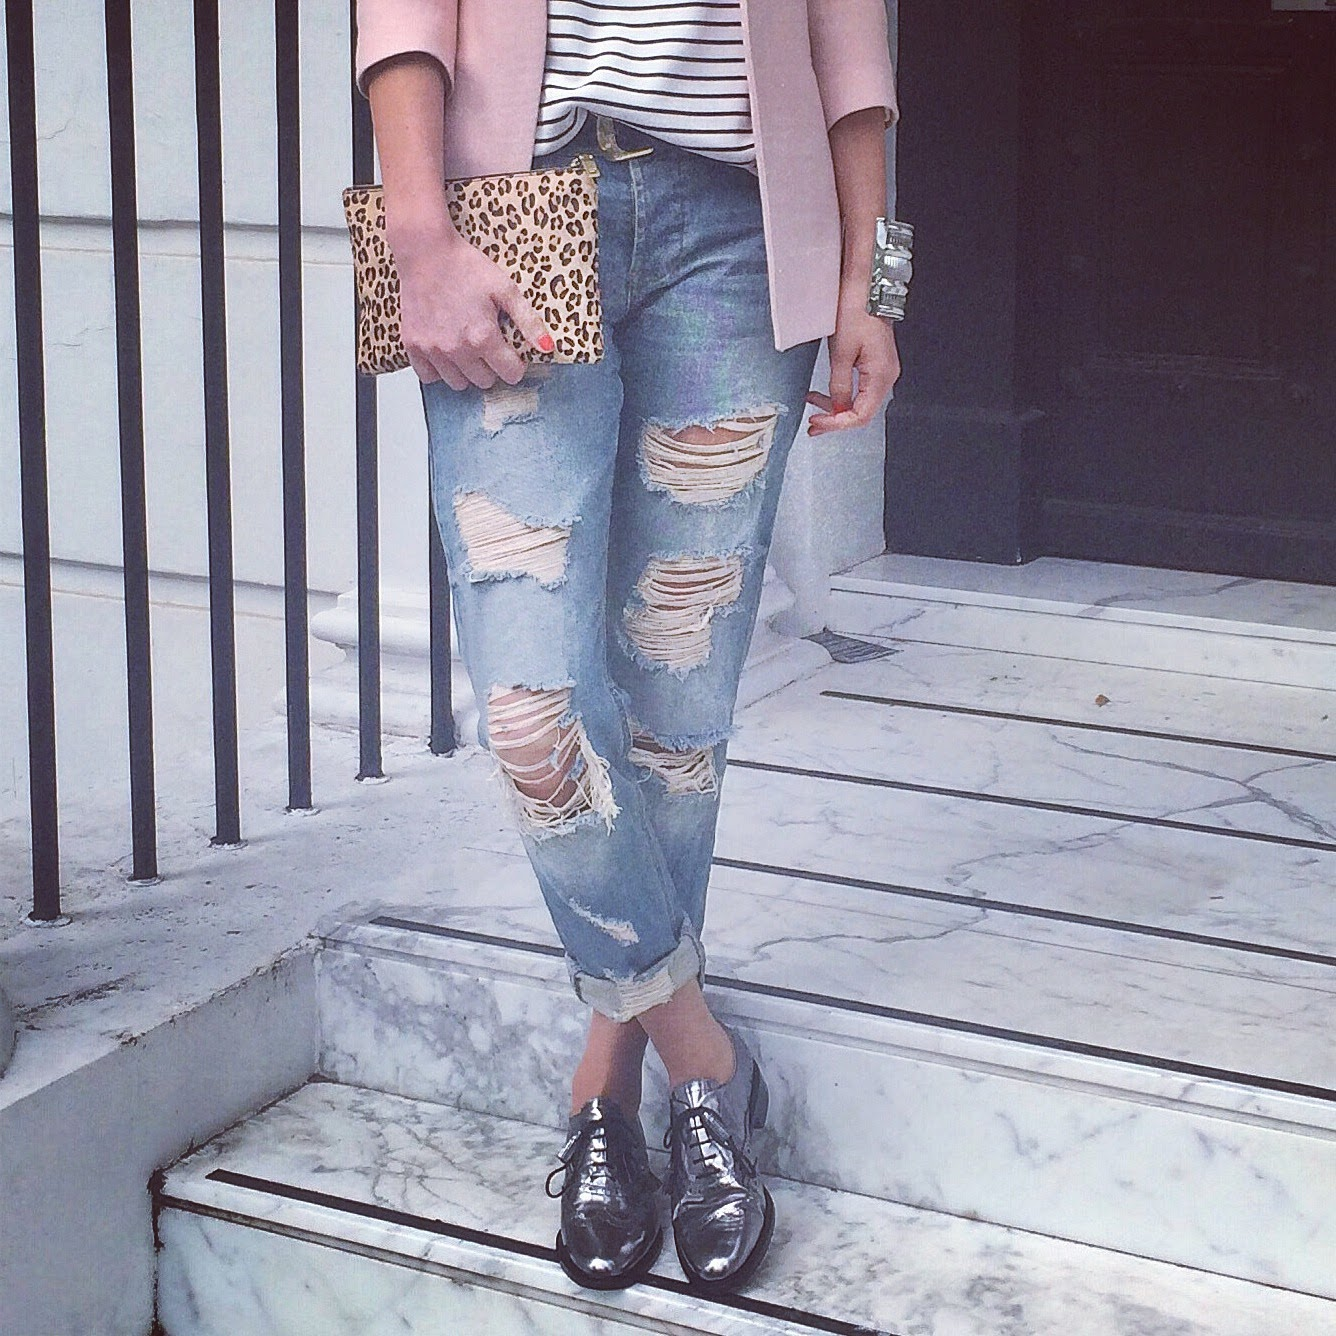 bruges, metallic bruges, hobbs bruges, bruge, asos ripped jeans, asos boyfriend jeans, striped top, breton stripes, pink blazer, blush pink blazer, pink zara blazer, j crew pouch, leopard print pouch